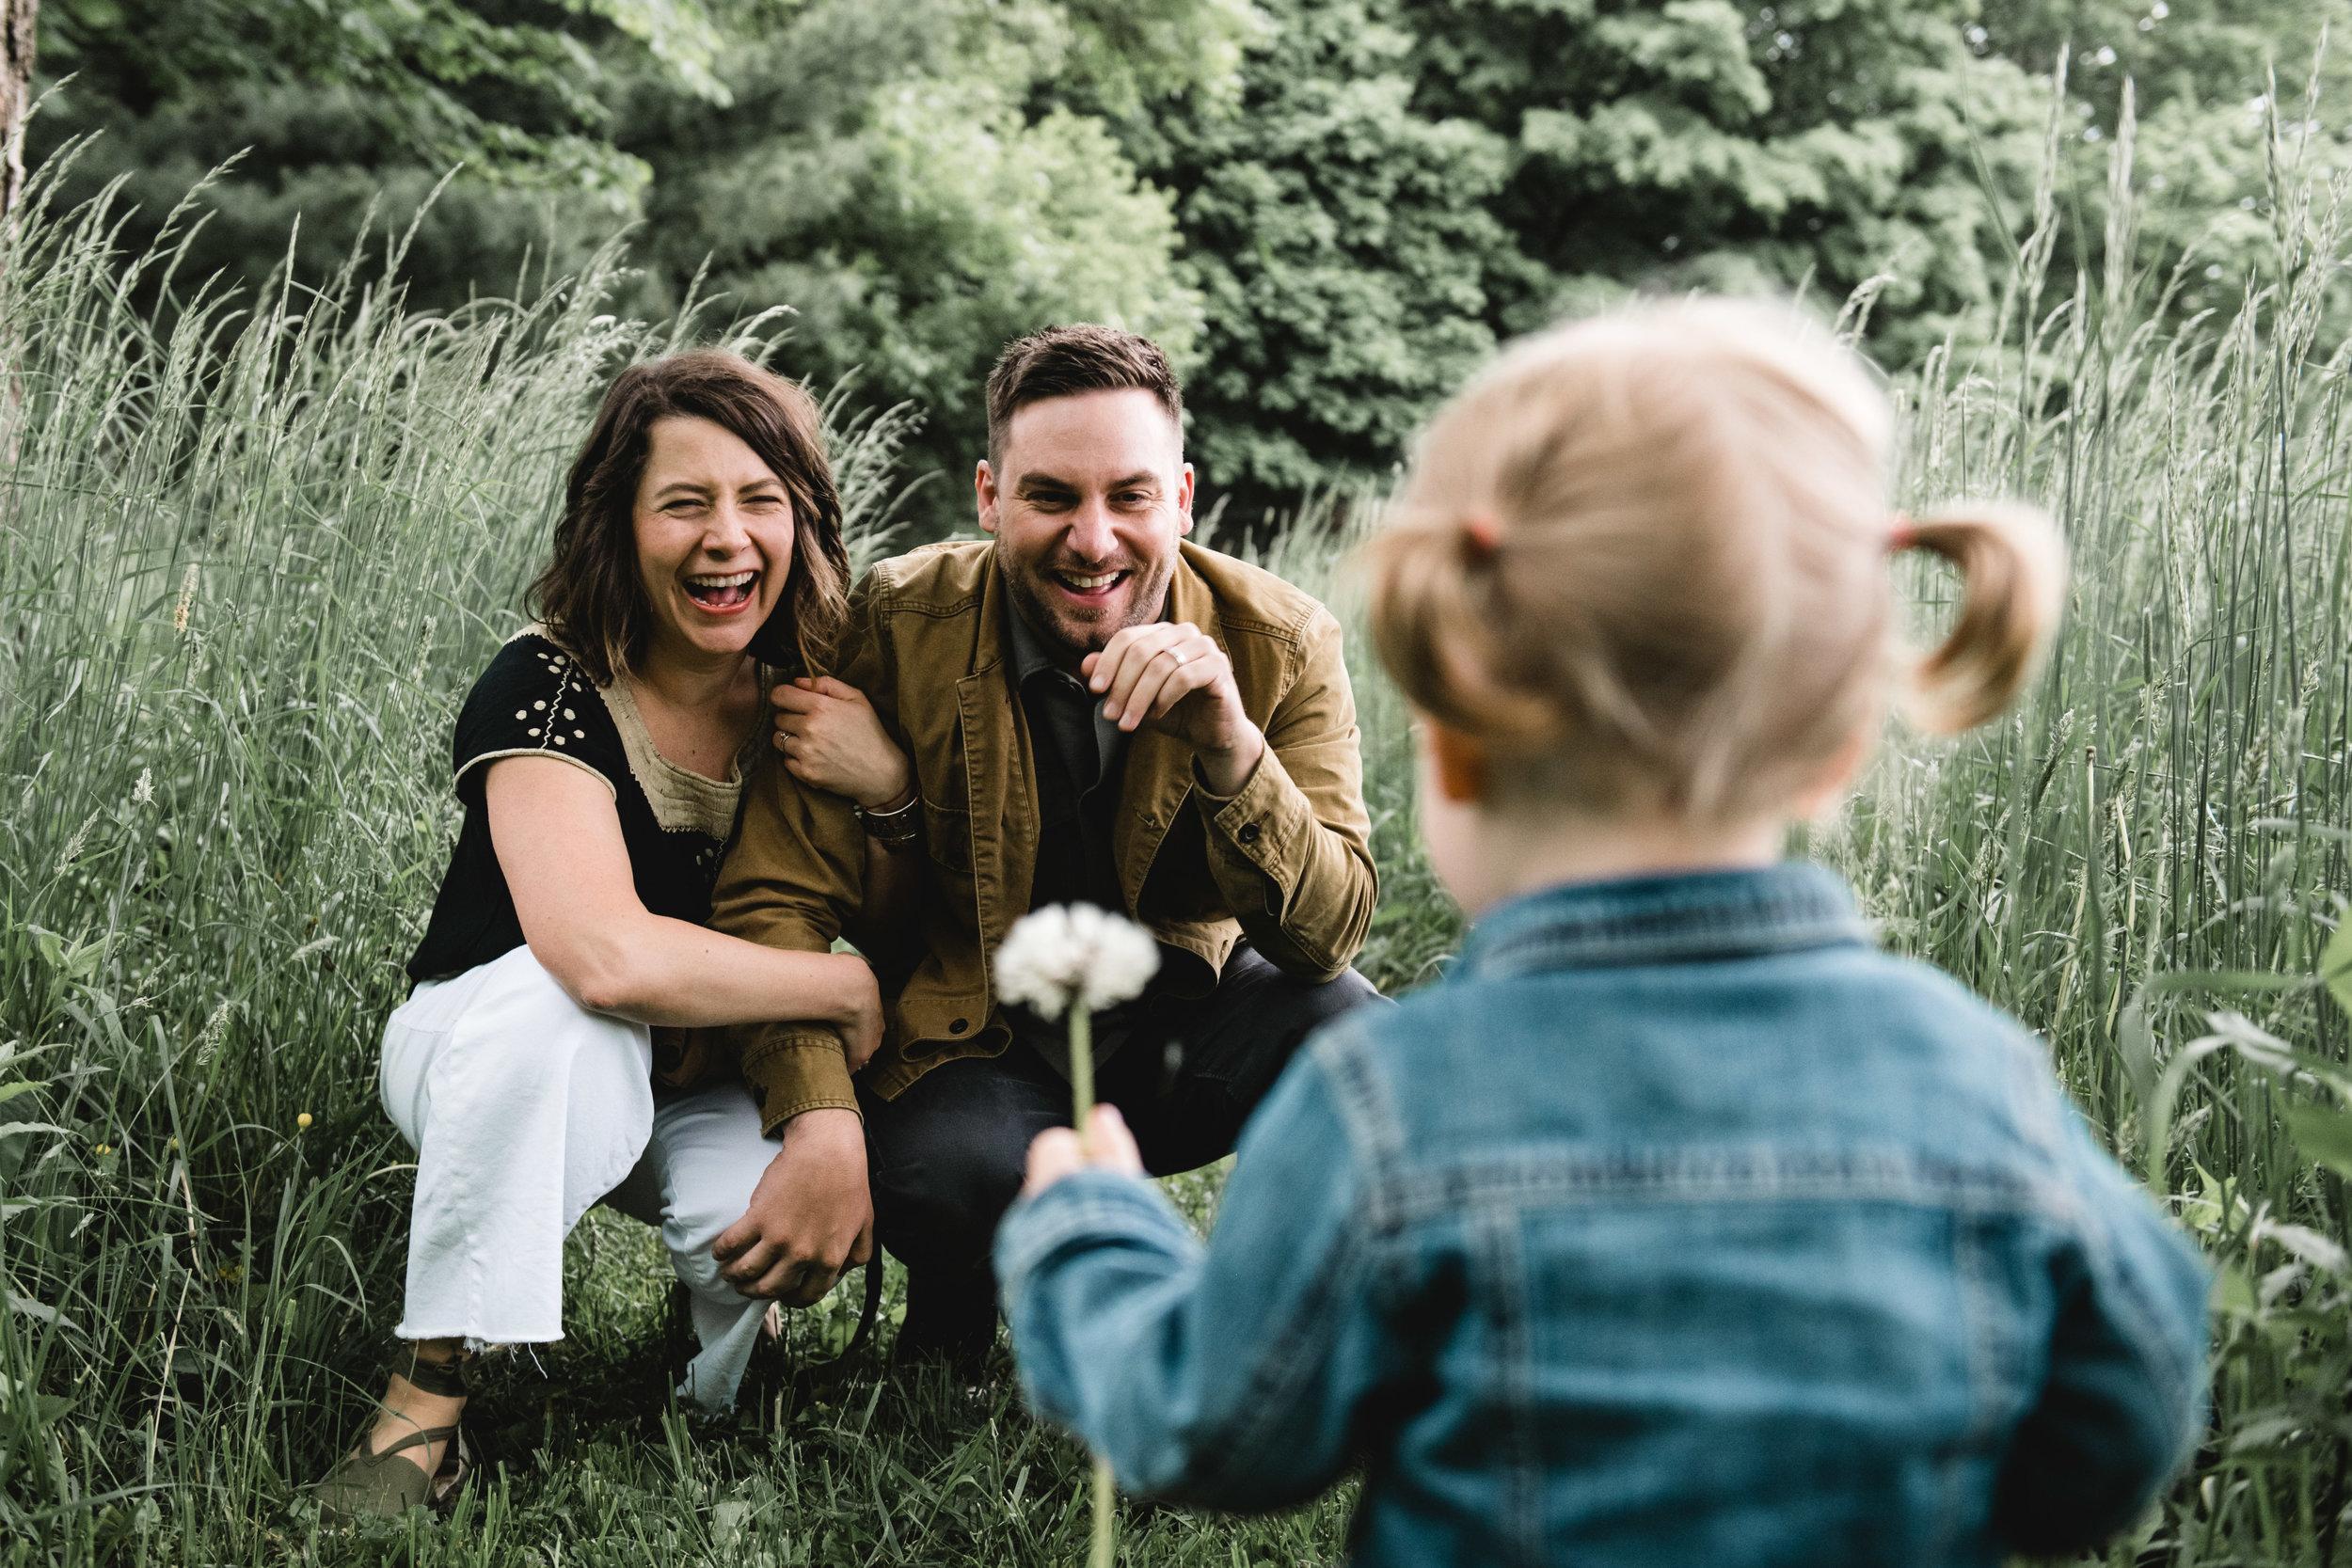 Boston Family Photography in a Field in Salem, Massachusetts